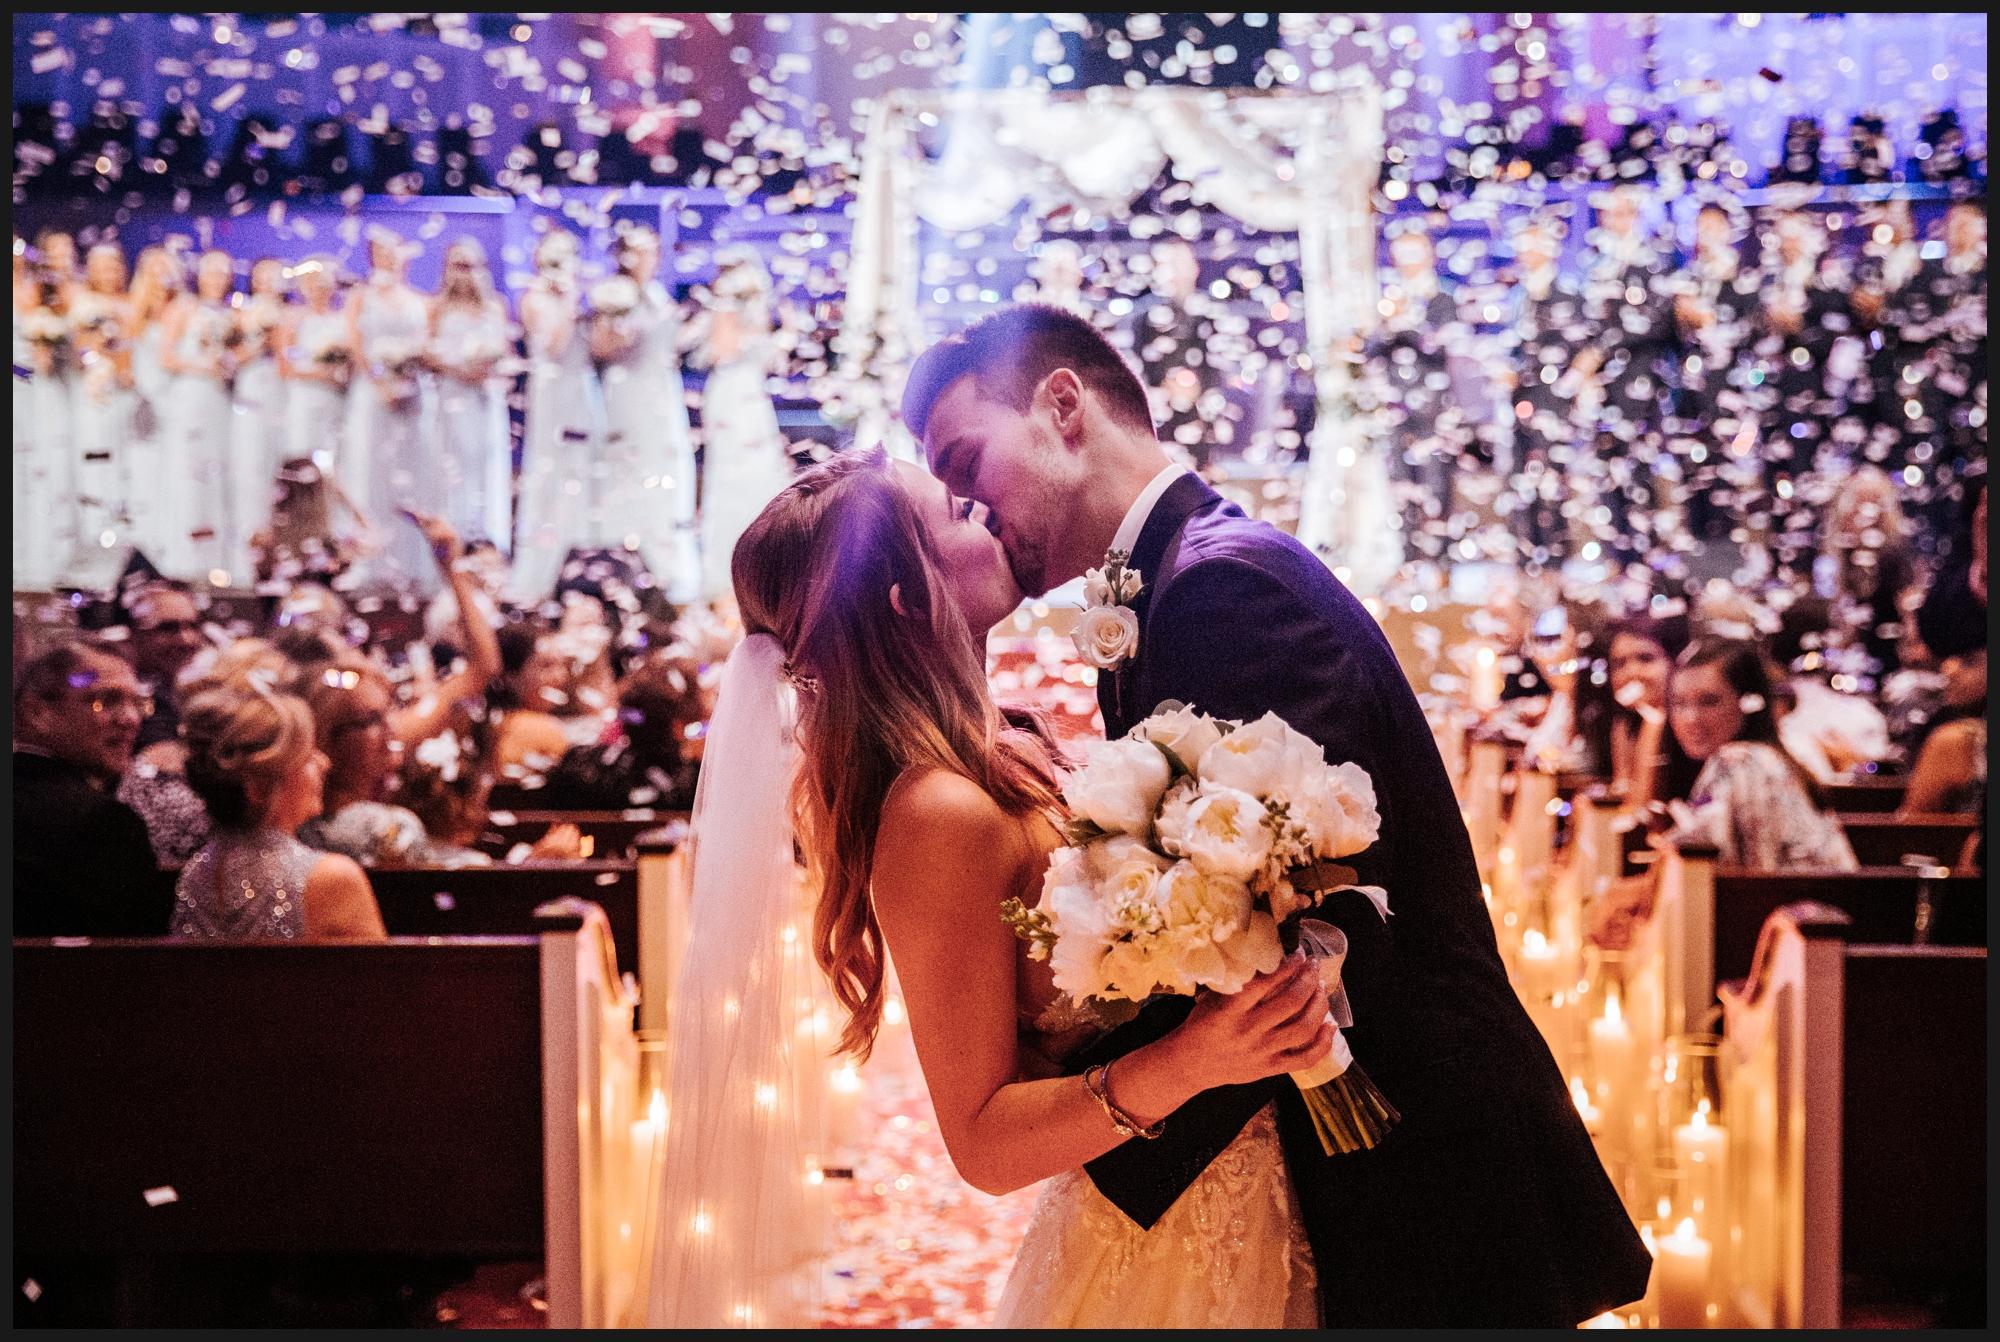 Orlando-Wedding-Photographer-destination-wedding-photographer-florida-wedding-photographer-bohemian-wedding-photographer_0089.jpg